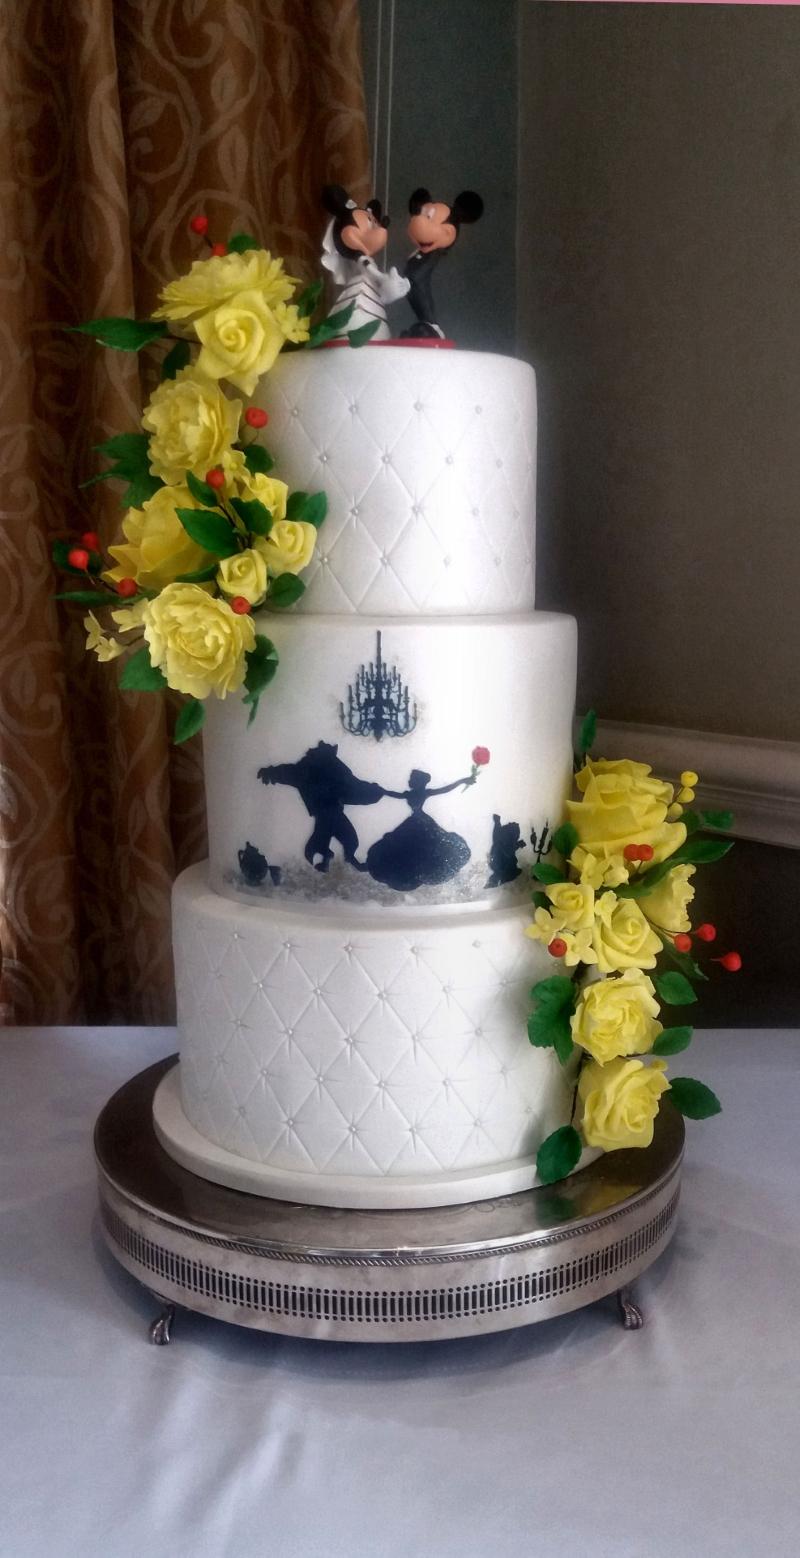 Beauty & The Beast Wedding Cake